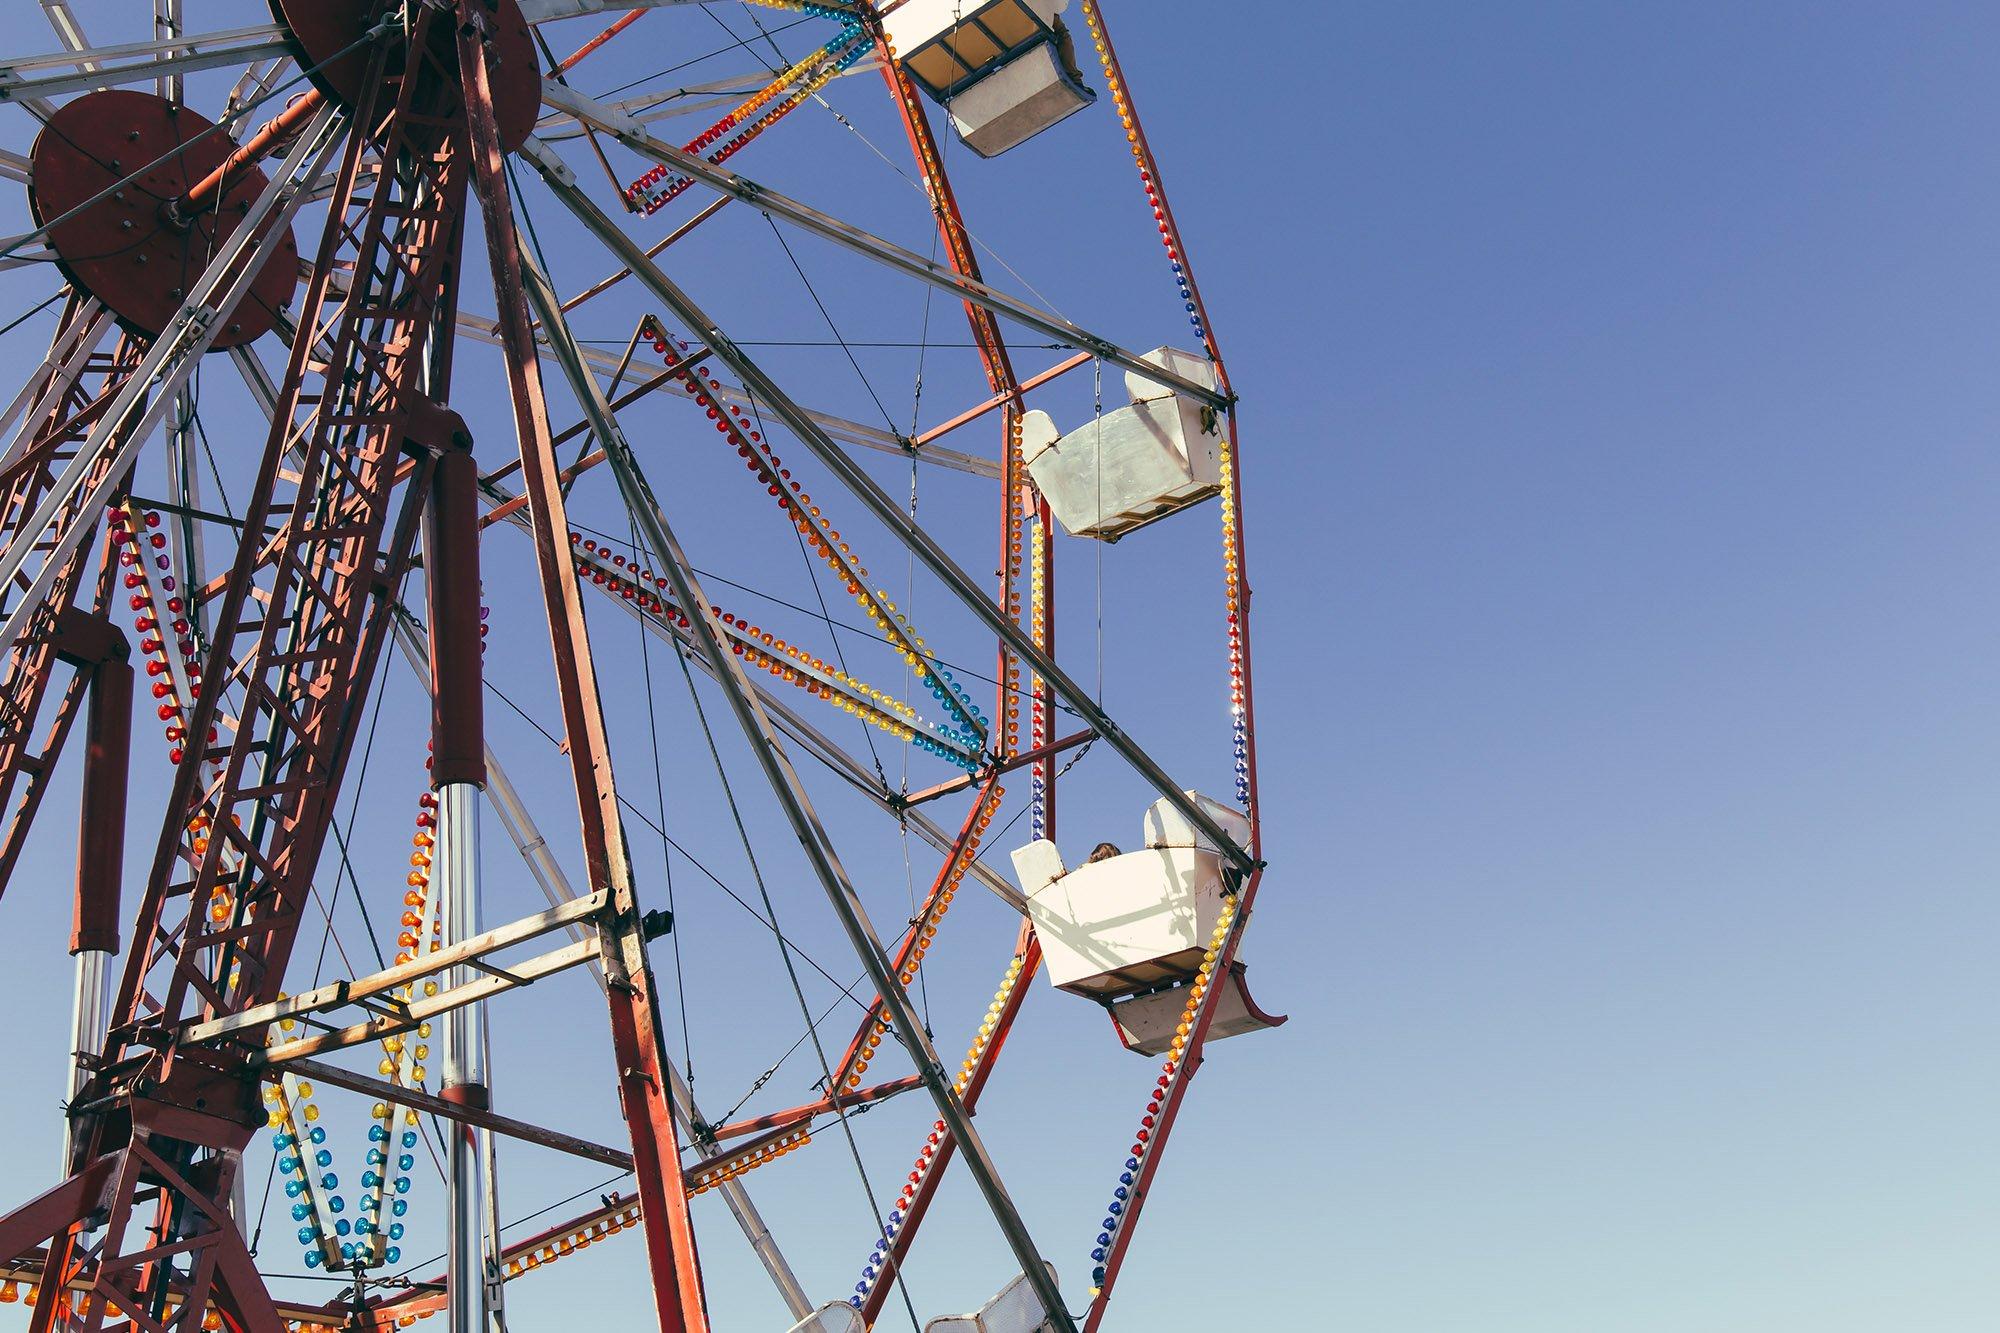 Banksy's Dismaland ferris wheel